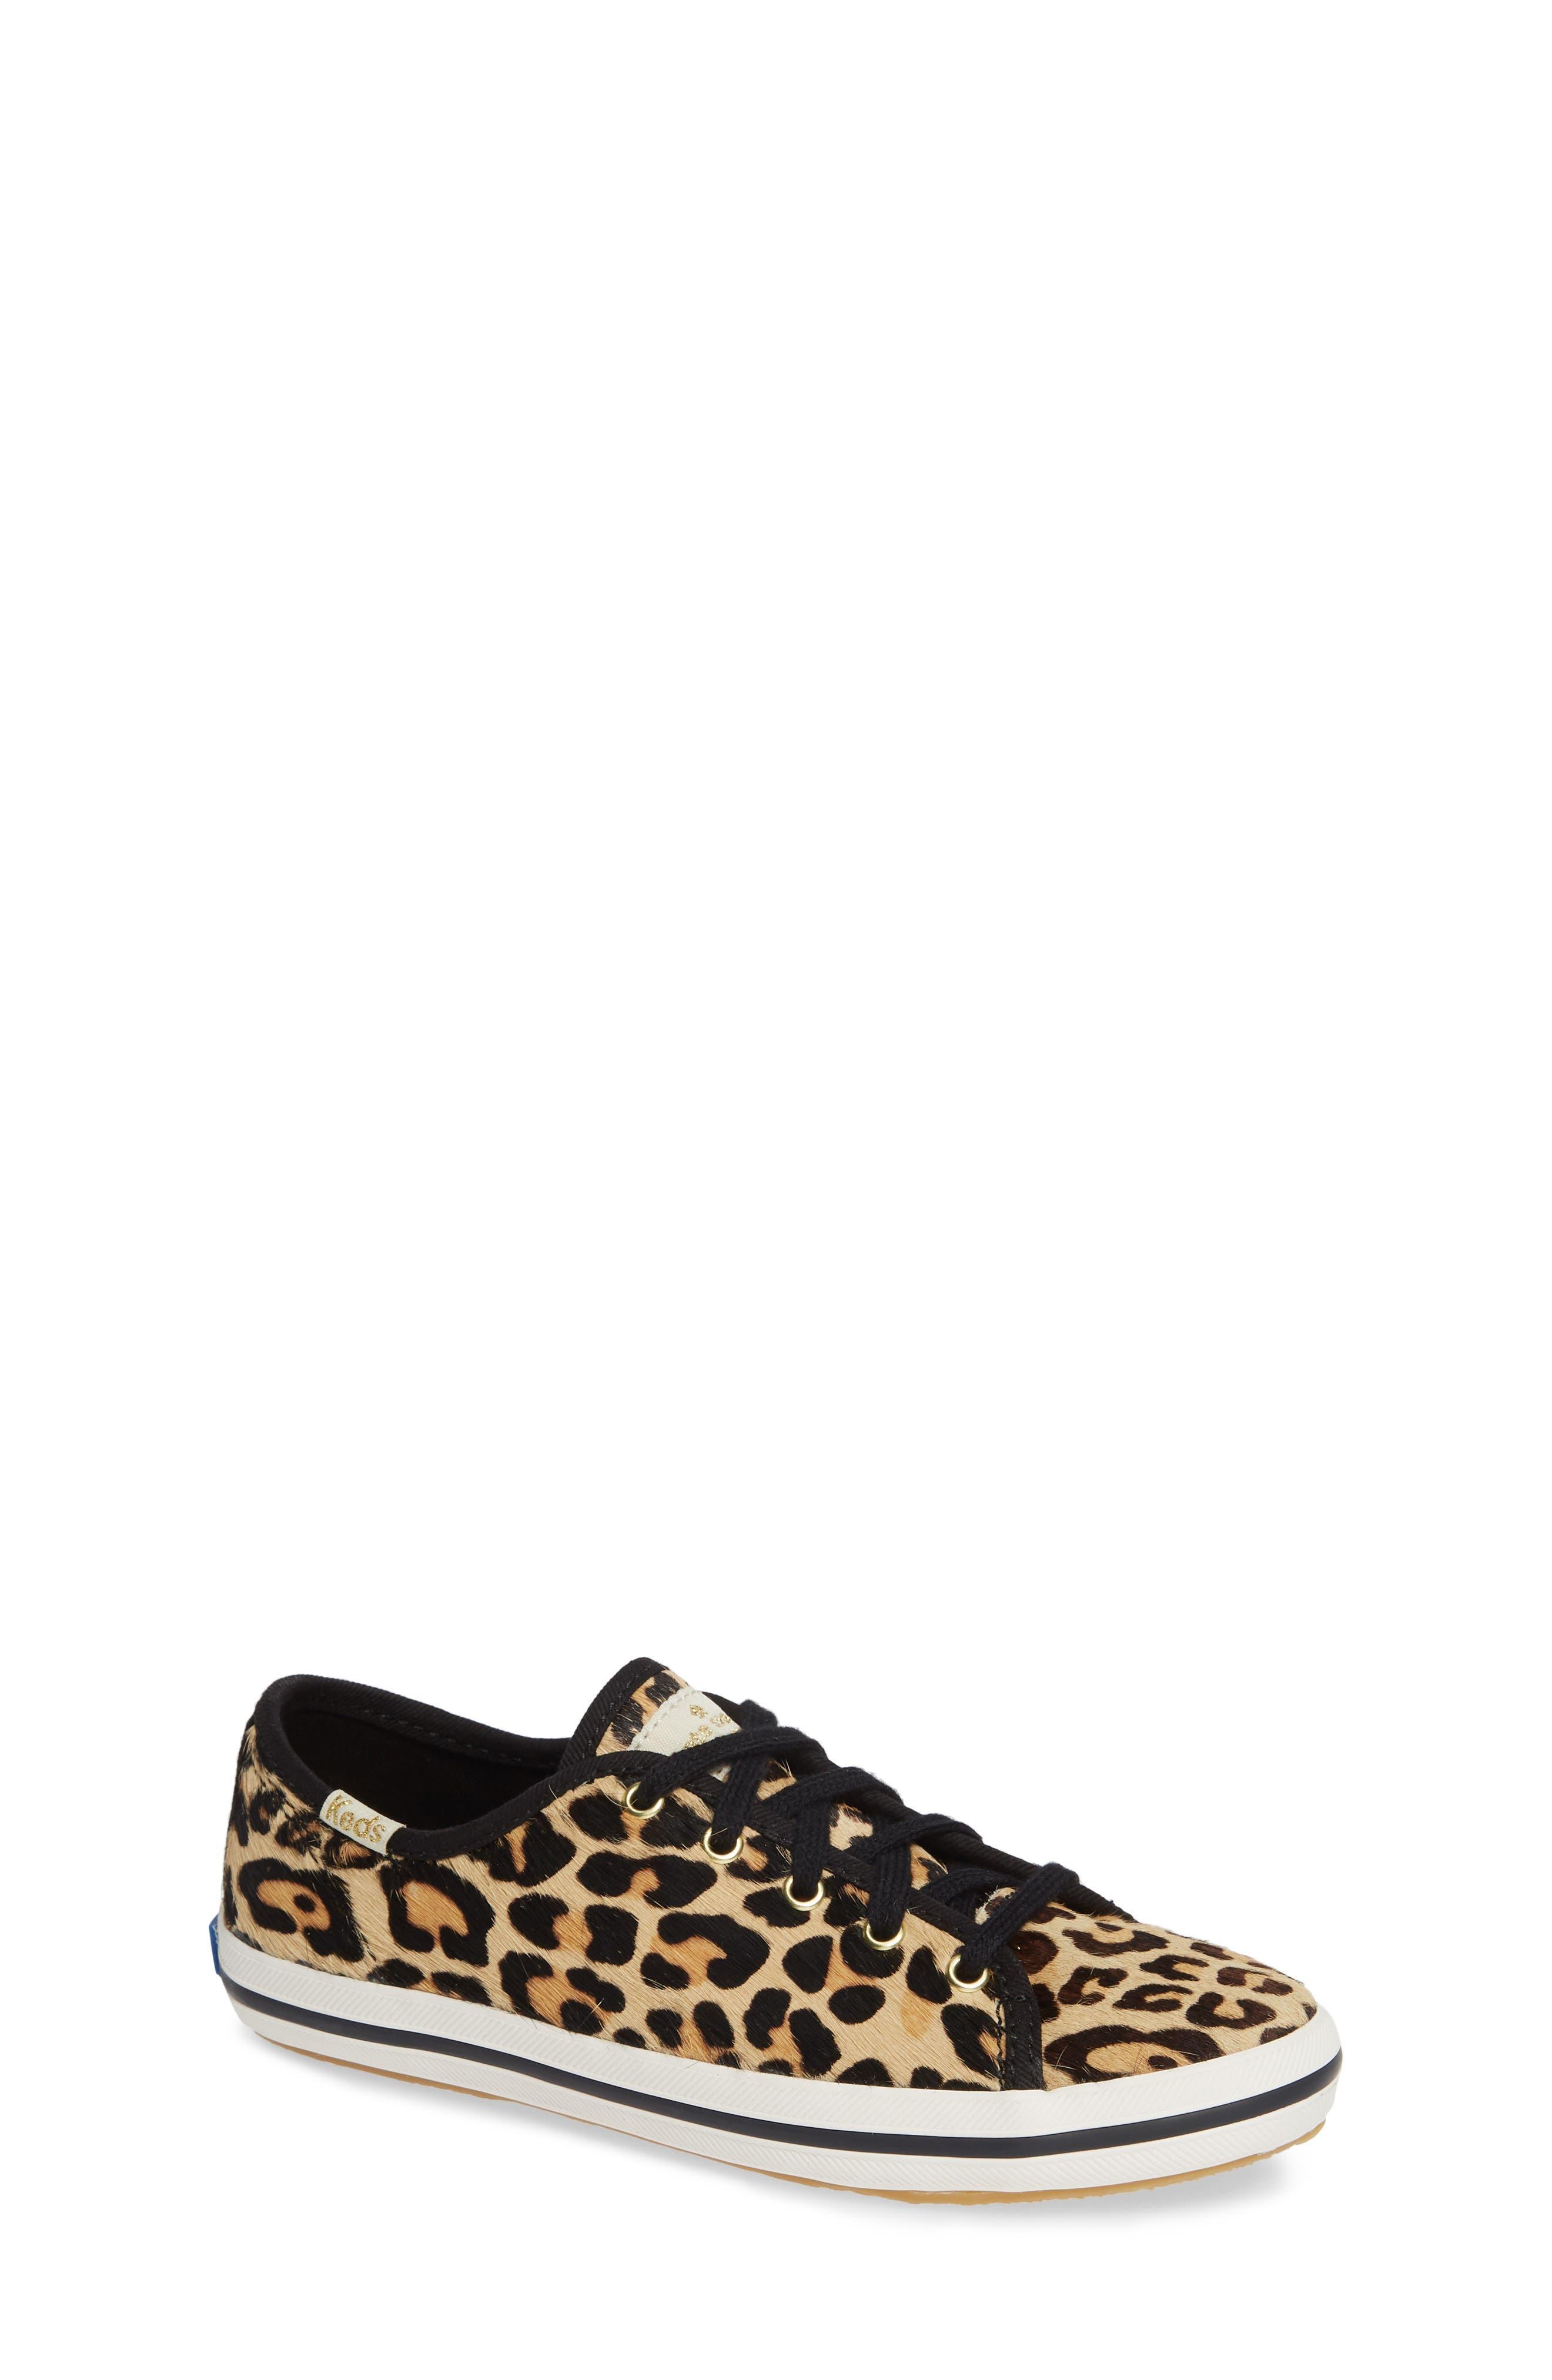 for kate spade new york kickstart genuine calf hair sneaker,                         Main,                         color, PRINTED PONY